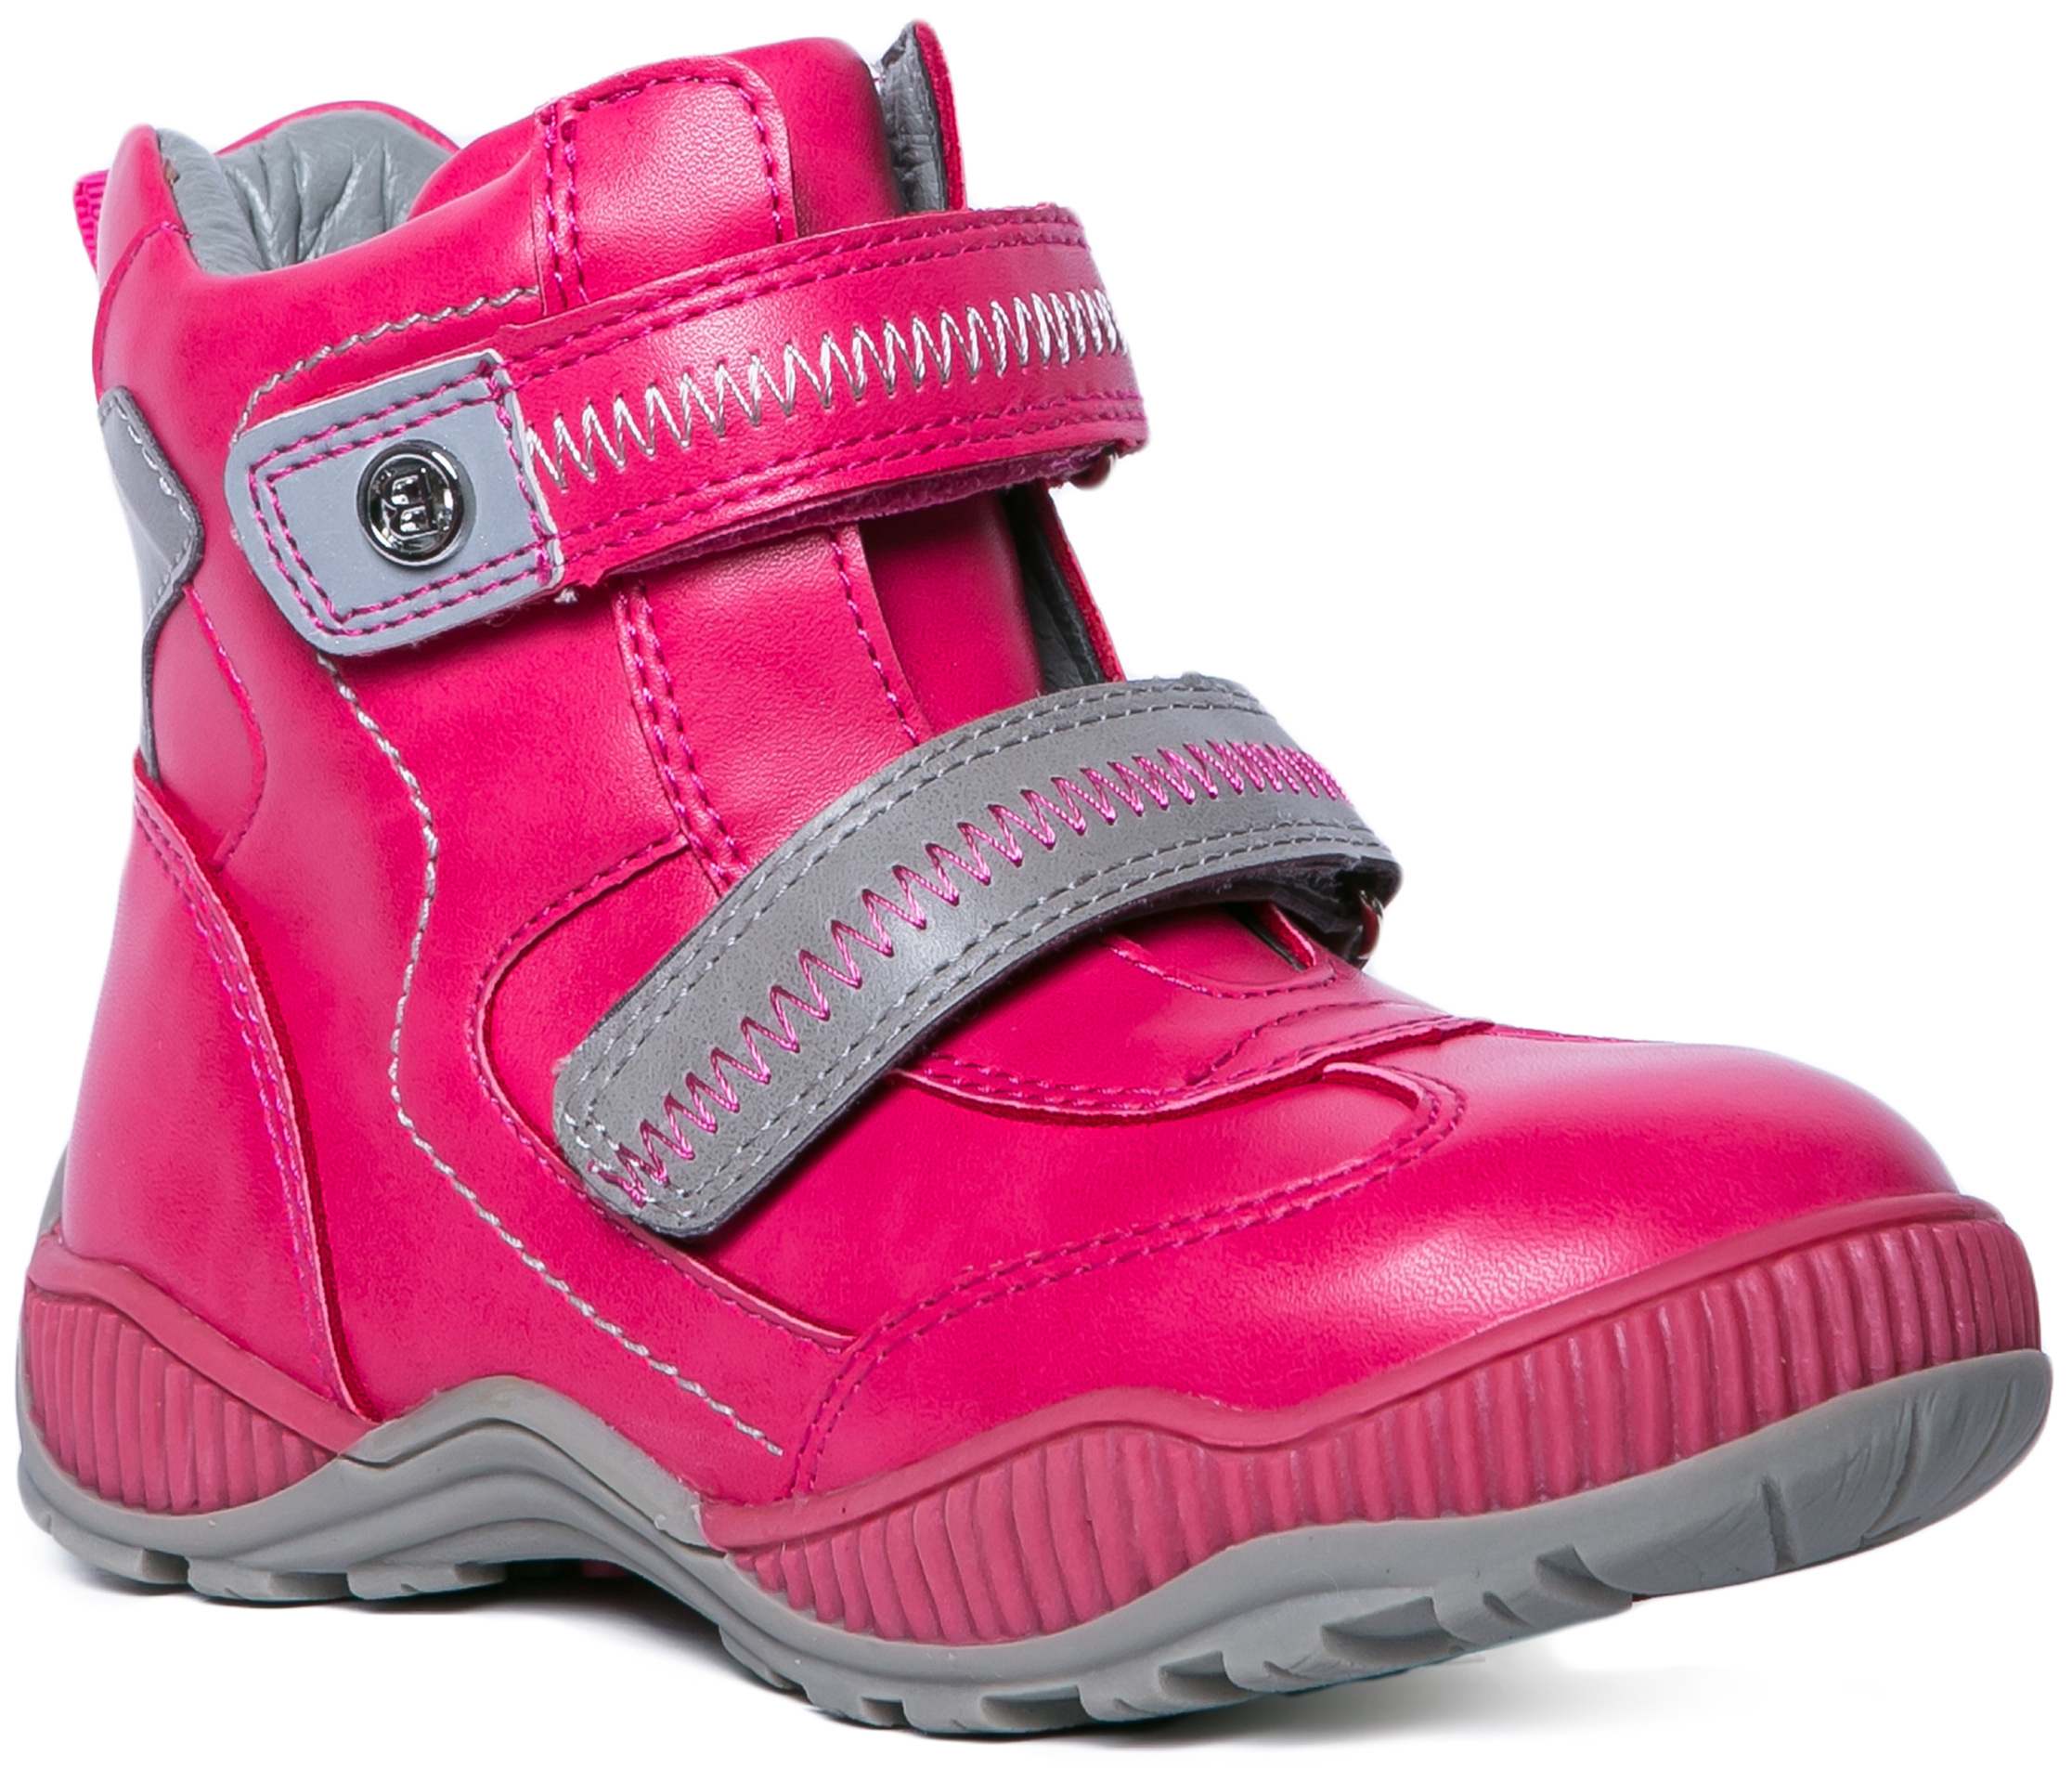 Ботинки и полуботинки Barkito Ботинки для девочки Barkito, фуксия цены онлайн